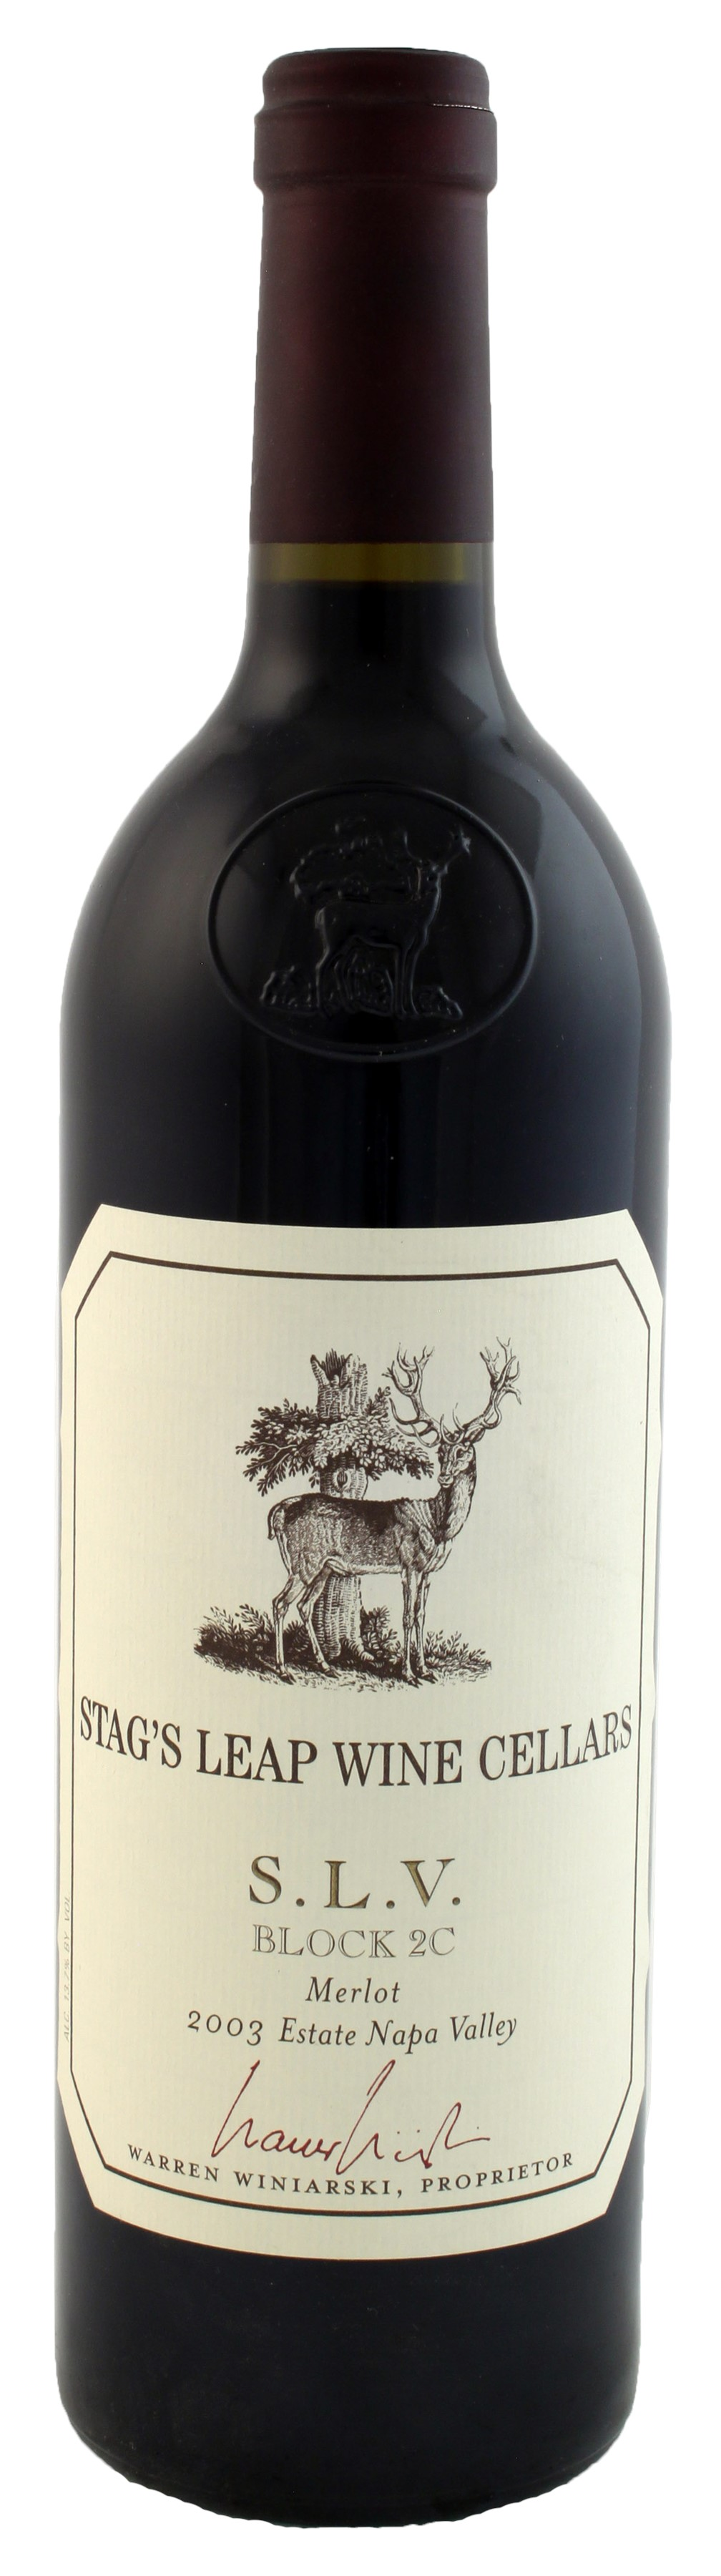 /BuyWine/Item/Auction/179796/2003-Stags-Leap-Wine-Cellars-SLV-Block-2C- Merlot.  sc 1 st  WineBid & Stagu0027s Leap Wine Cellars SLV Block 2C Merlot 2003 Red Wine from ...